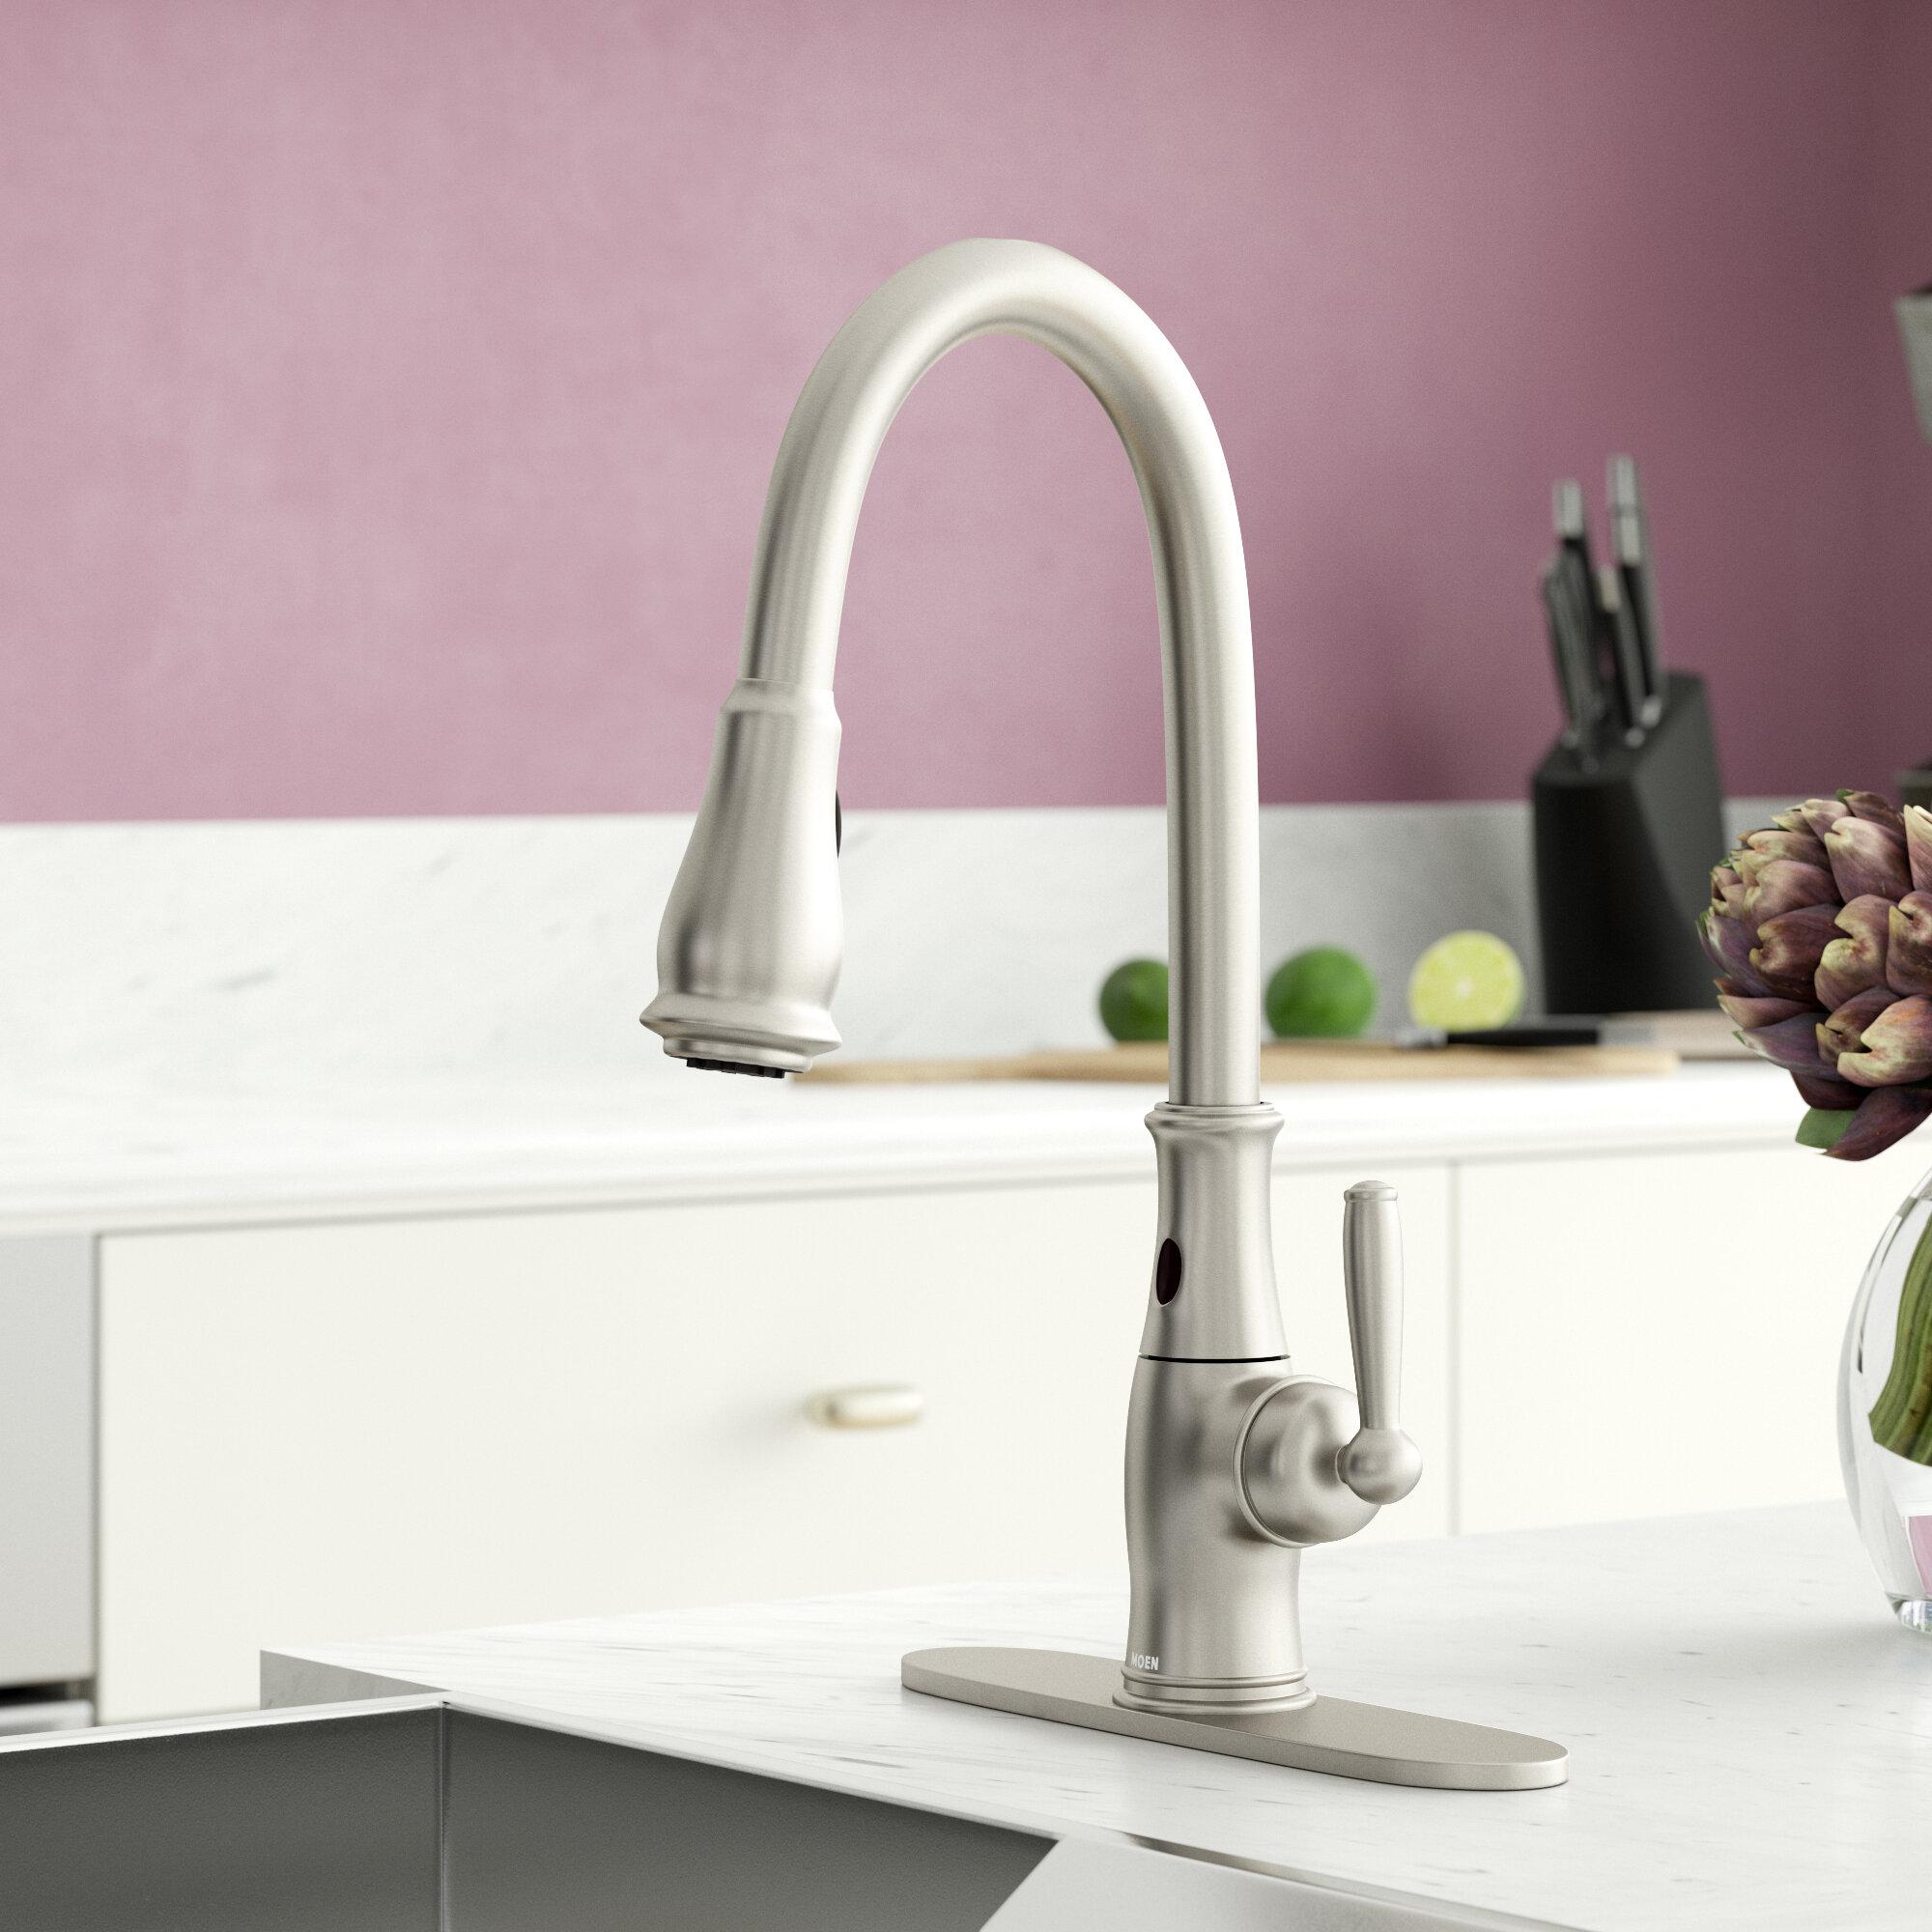 7185esrs C Orb Moen Brantford Pull Down Touchless Single Handle Kitchen Faucet Reviews